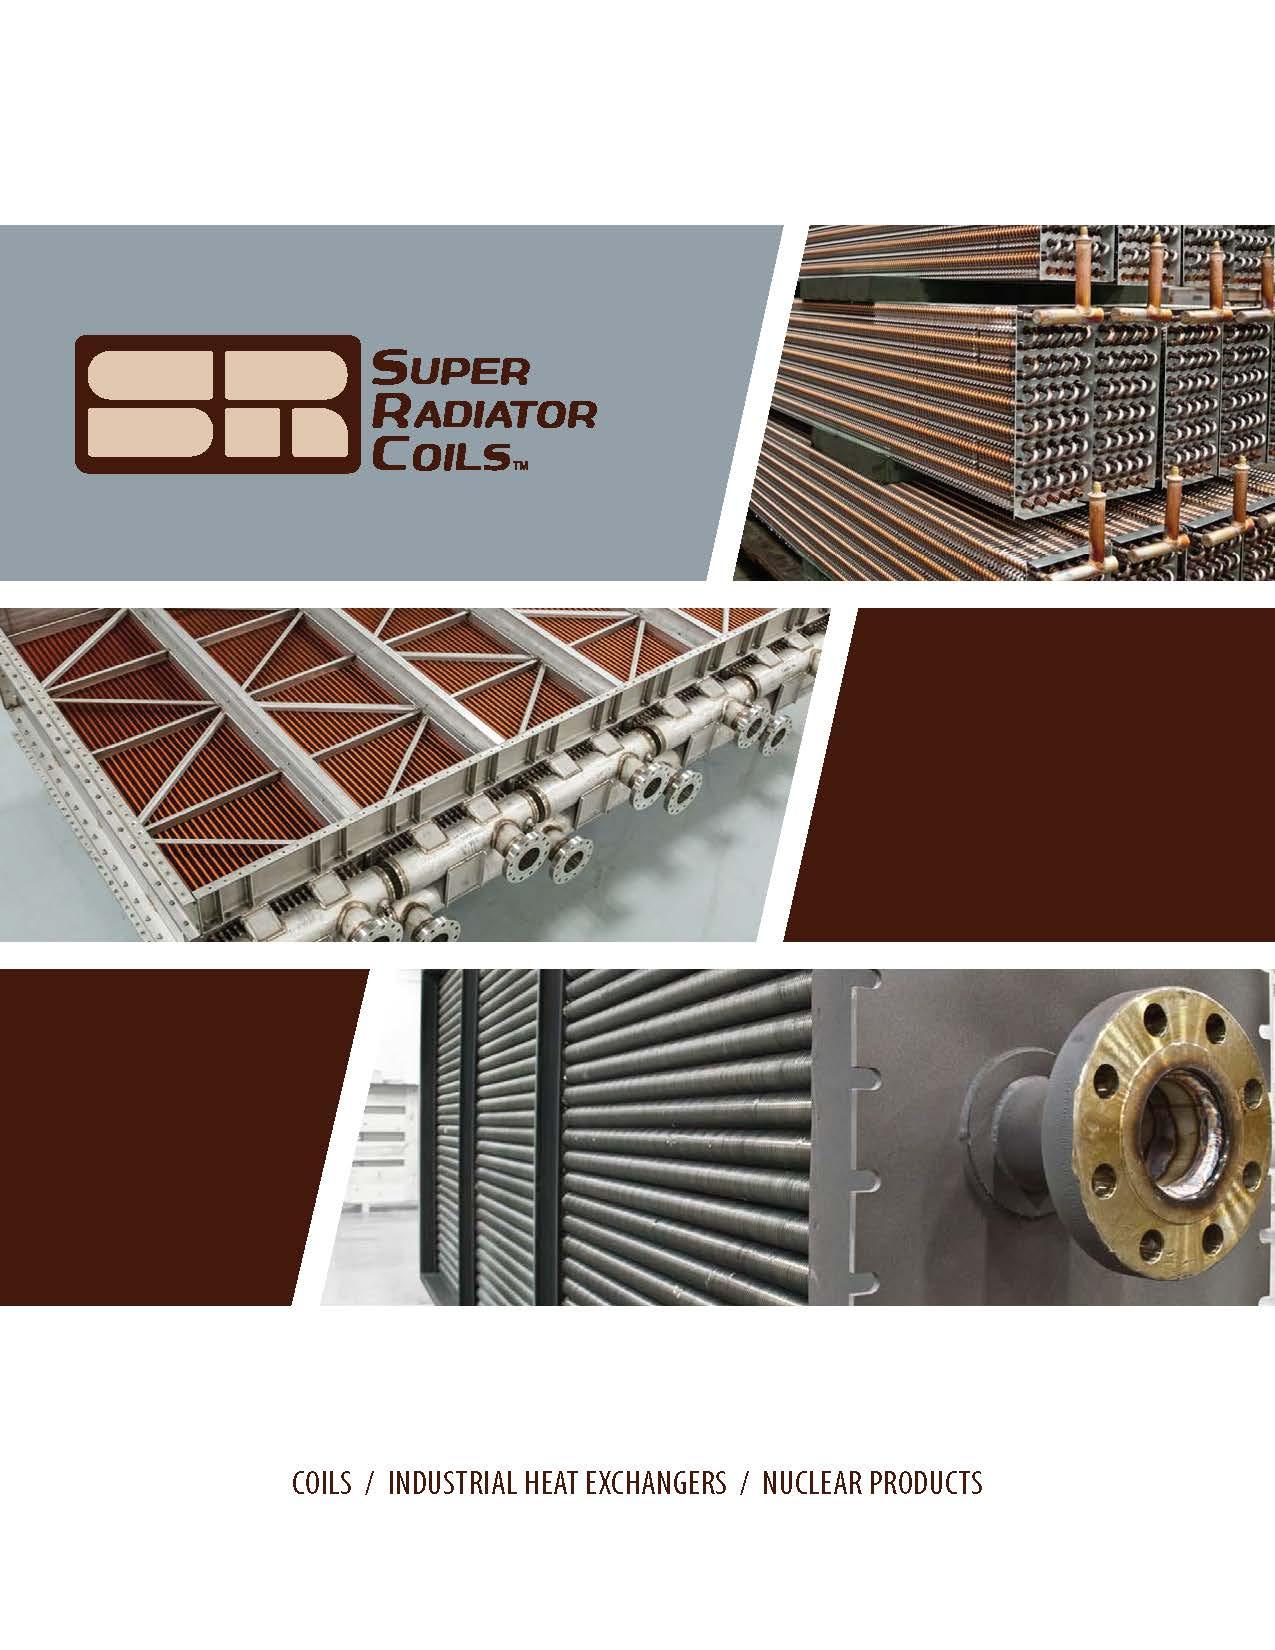 Super-Radiator Coils Company Brochure